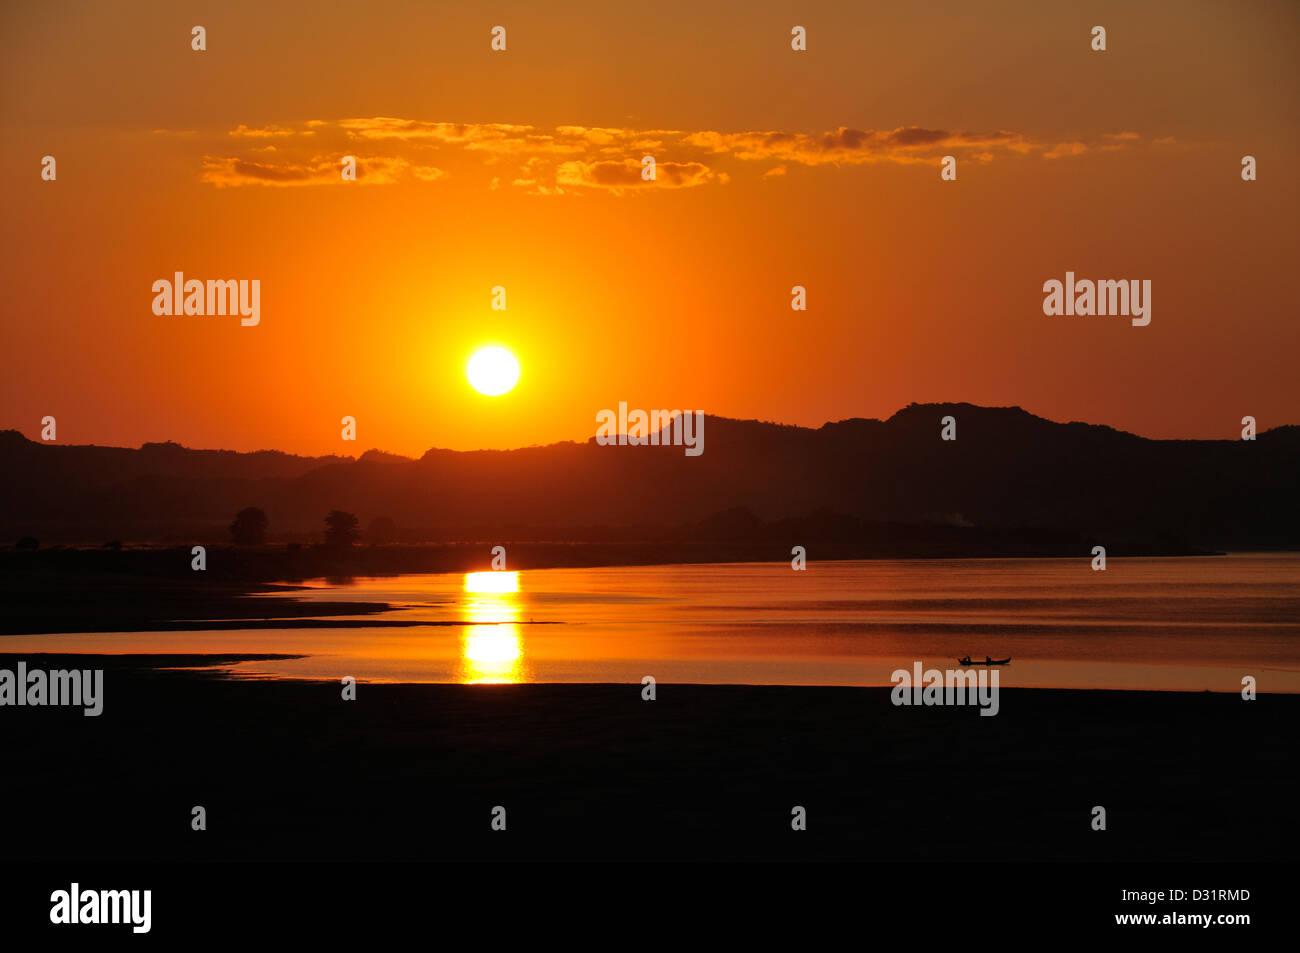 Sunset over Ayeyarwady River, Bagan, Burma, Myanmar Stock Photo